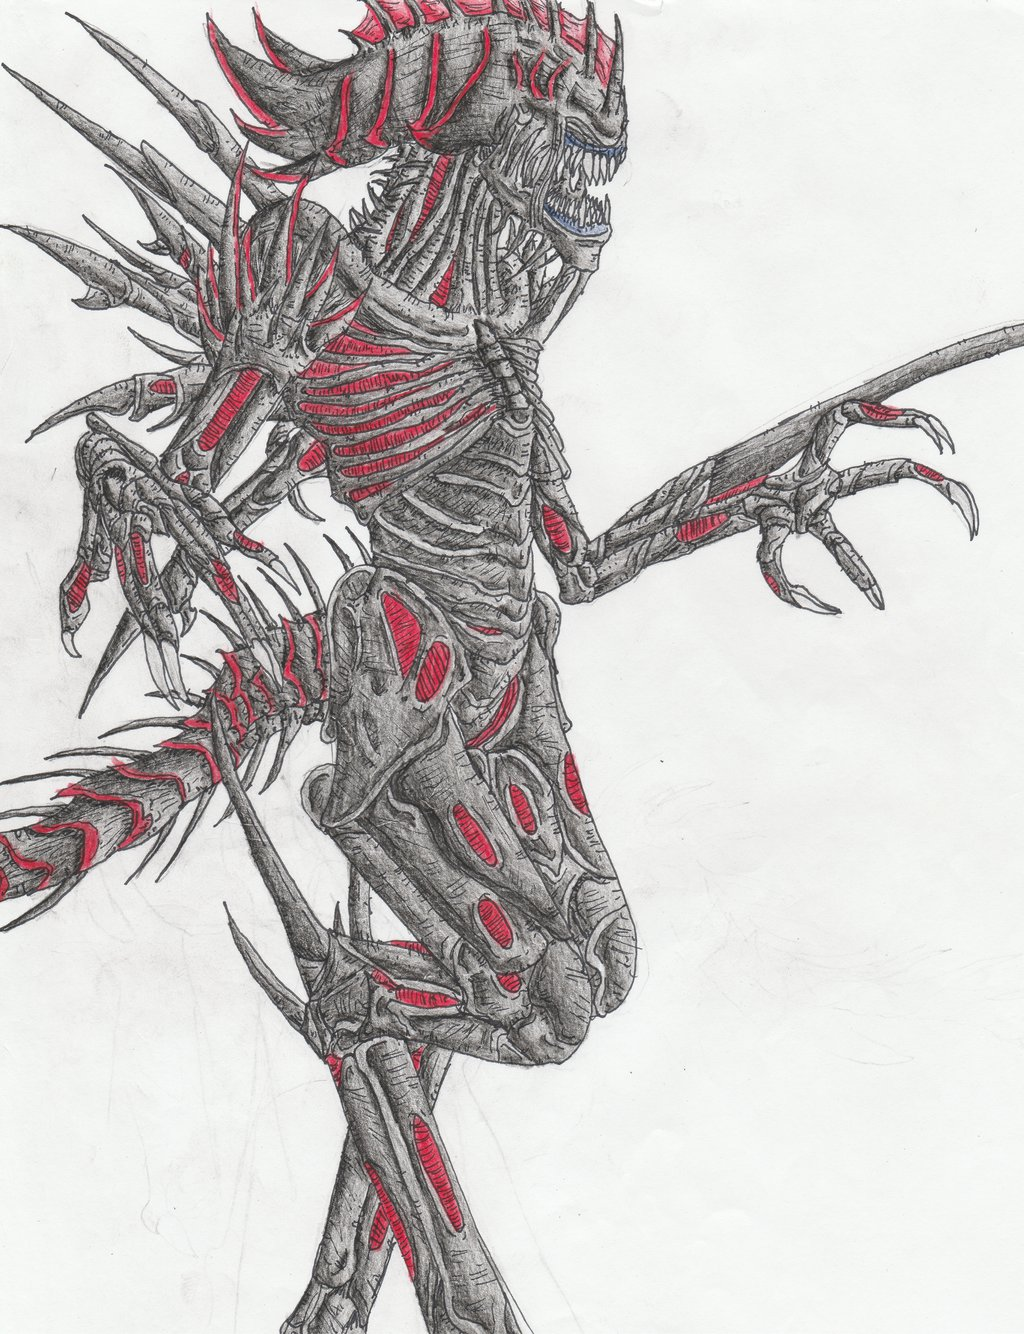 Xenomorph clipart praetorian On 6 armblades DeviantArt 46